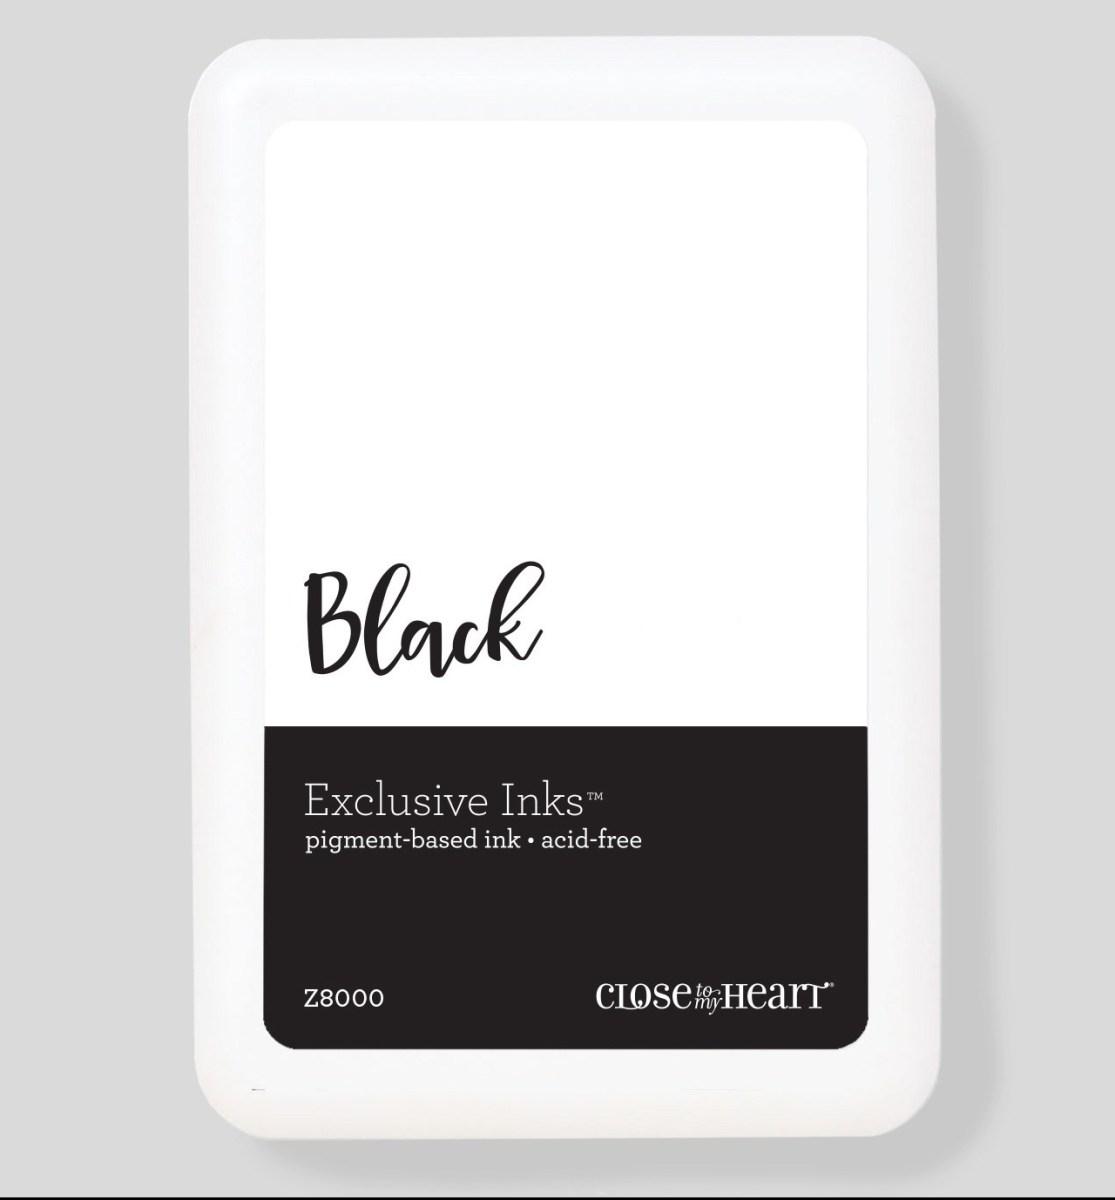 Black Ink Options #closetomyheart #ctmh #blackinks #inkpads #stamppads #pigmentinks #pigmentpads #exclusiveinks #archivalblack #intenseblack #blackpigment #stazon #scrapbooking #cardmaking #papercrafting #diy